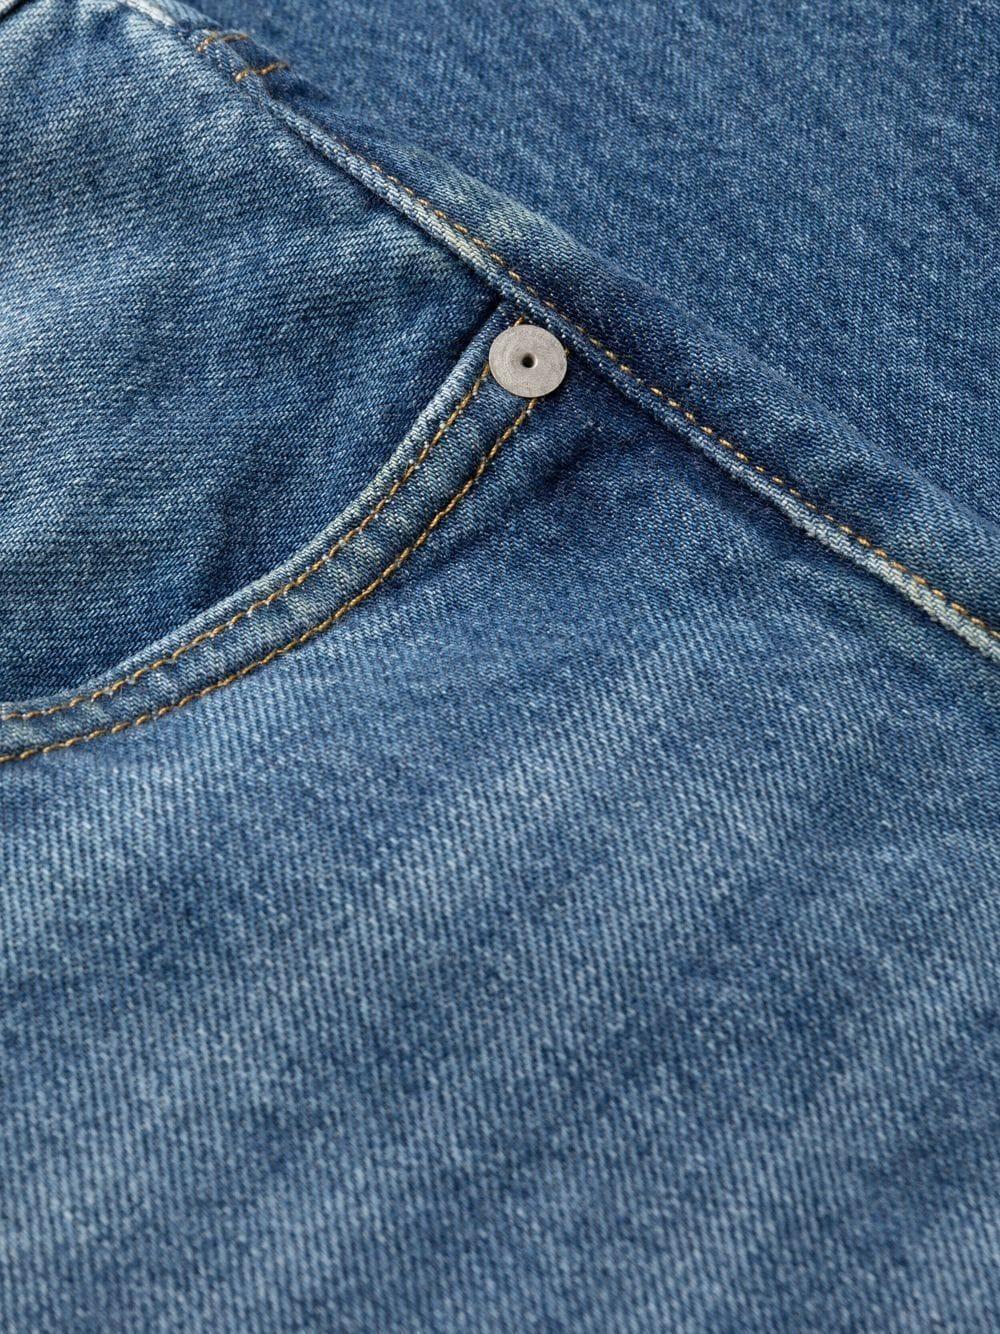 jeans dritti uomo denim MAISON MARGIELA | Jeans | S50LA0189 S30561966